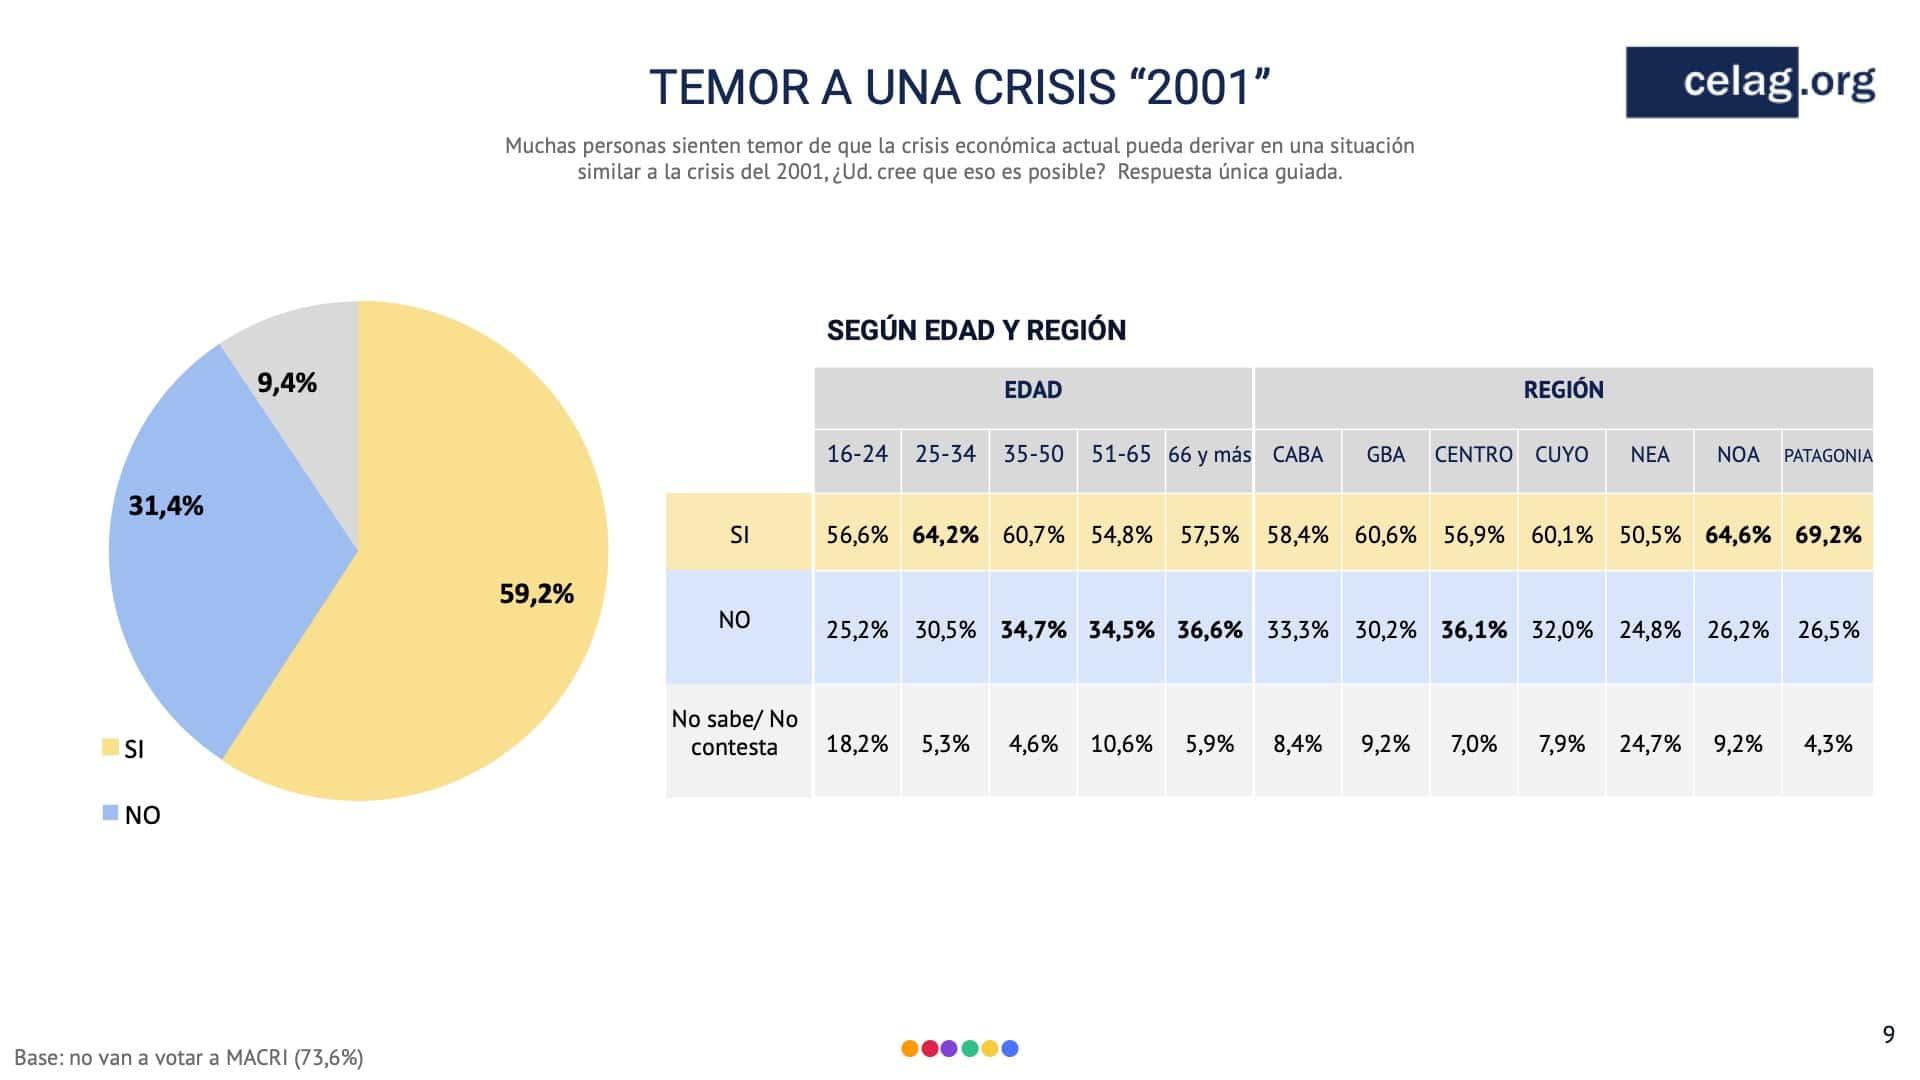 temor a una crisis 2001 argentina